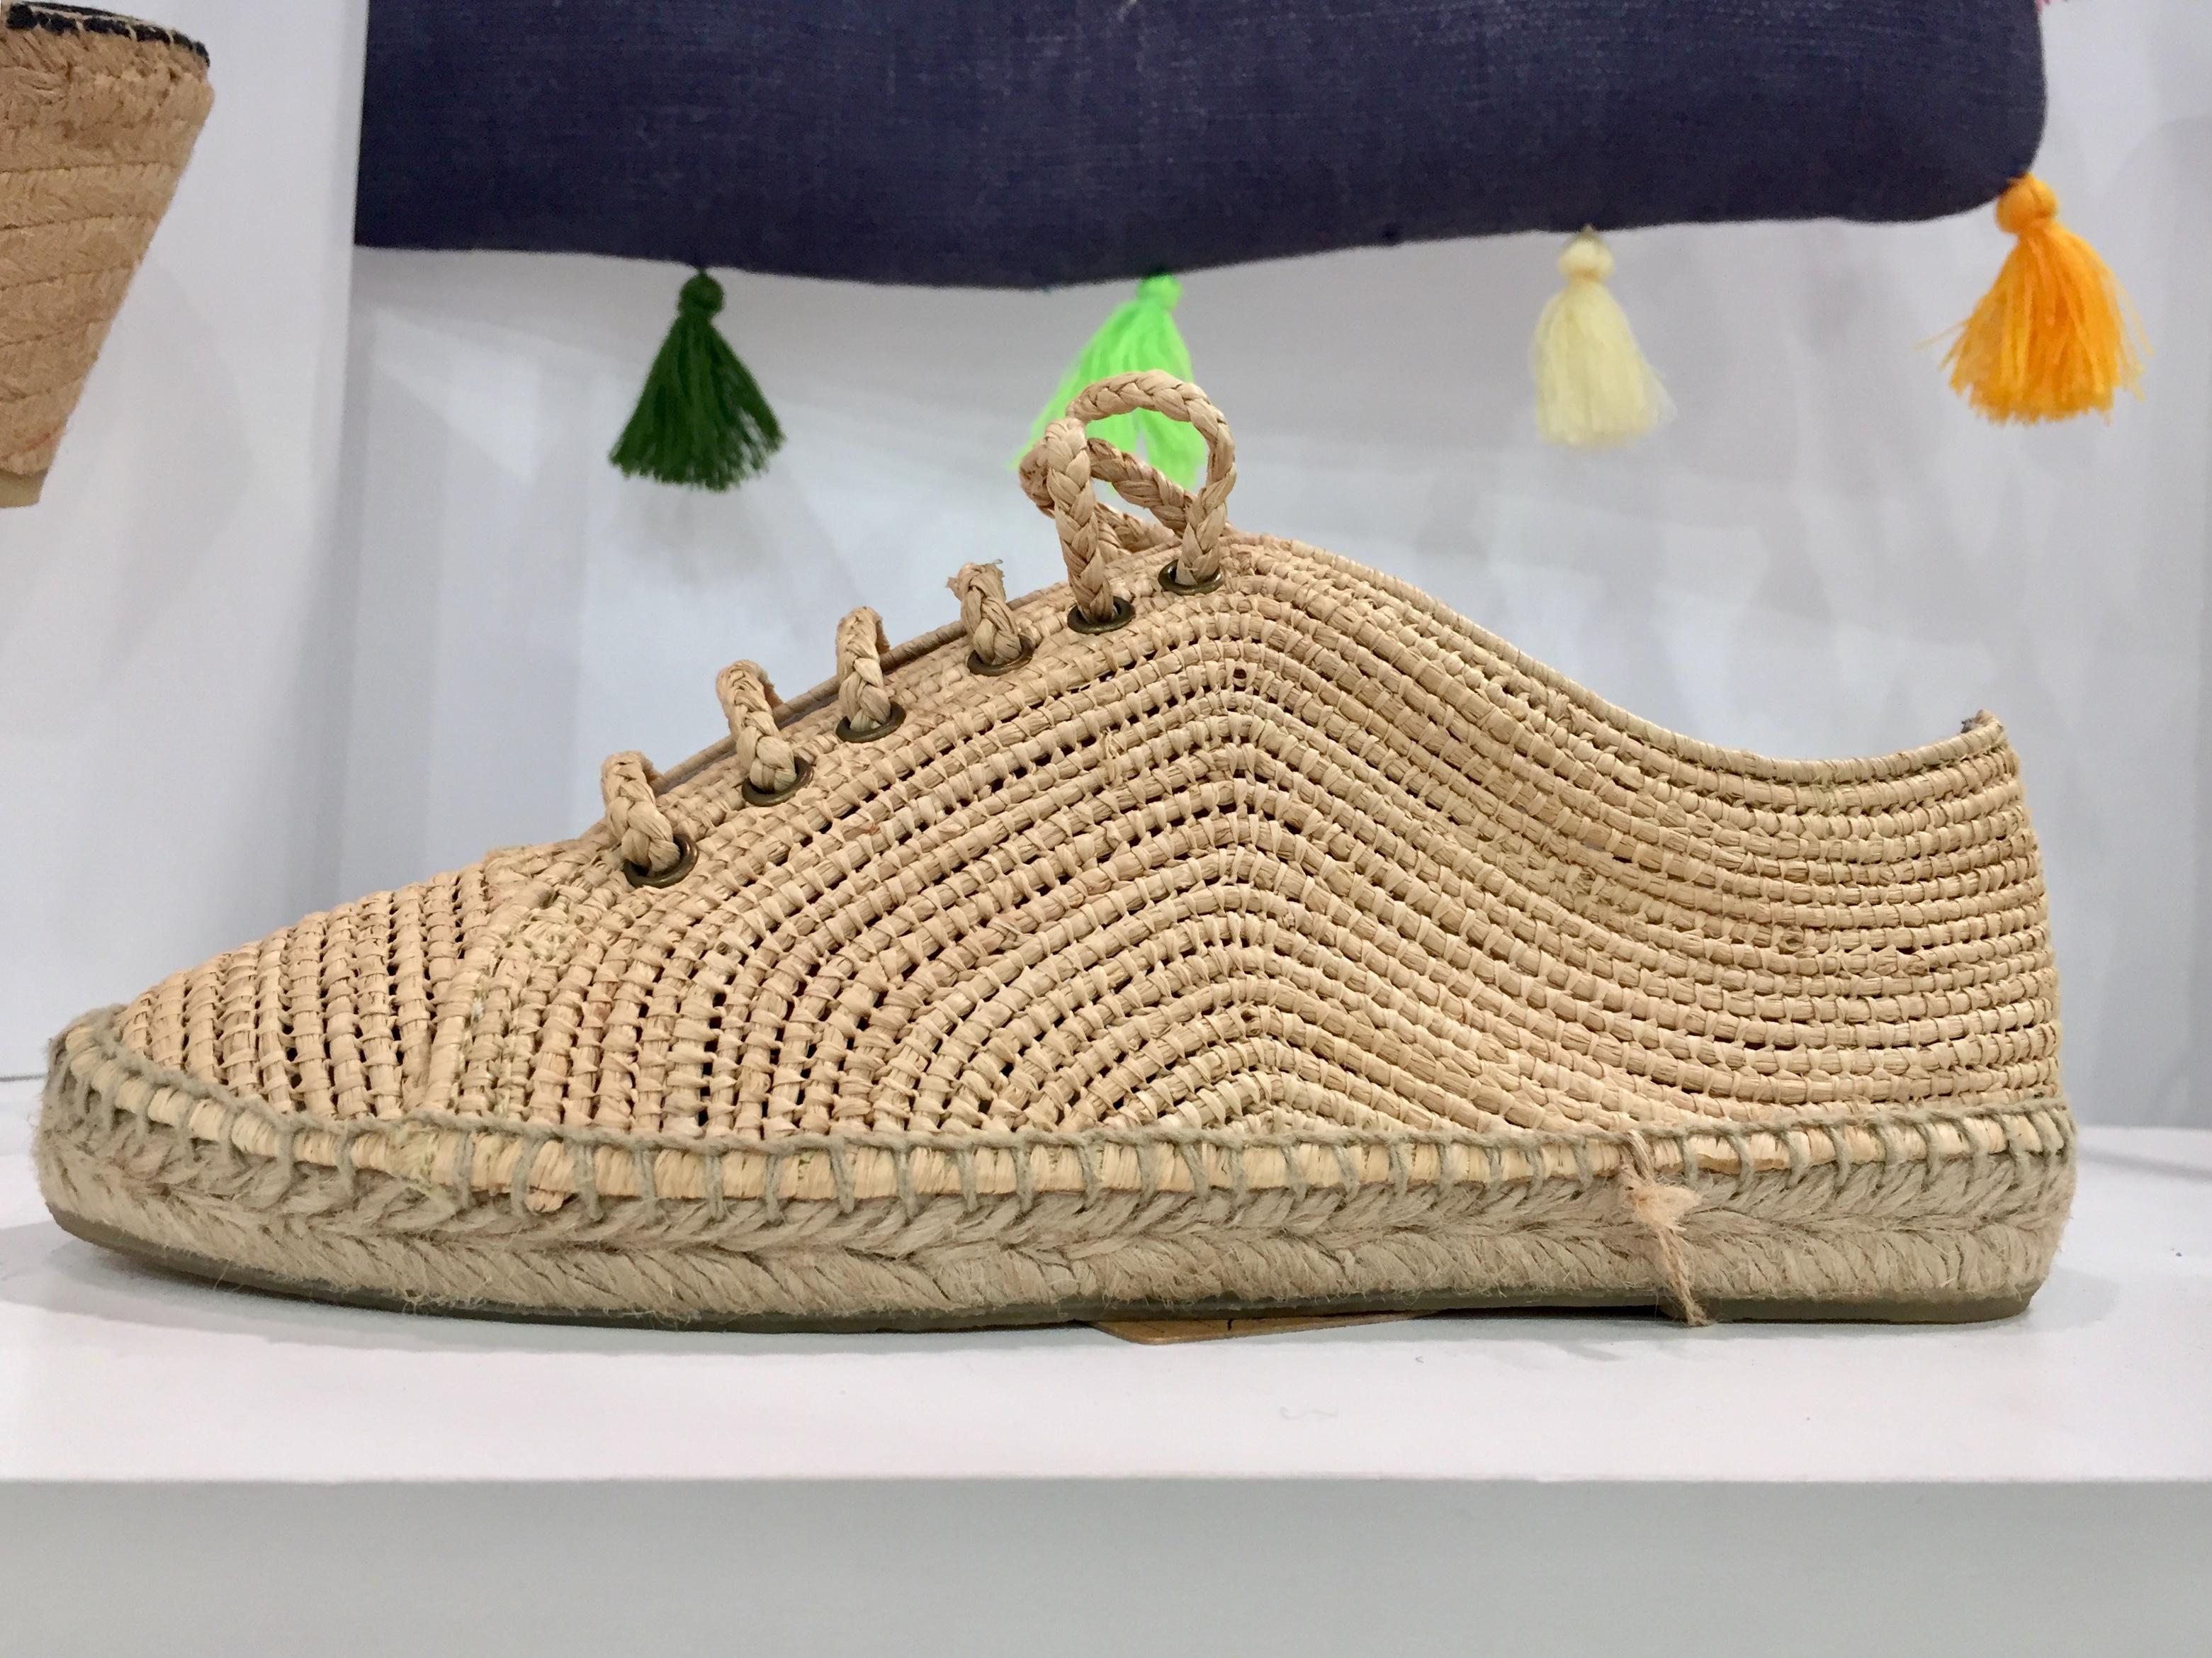 A jute-woven espadrille sneaker style from Sonali.